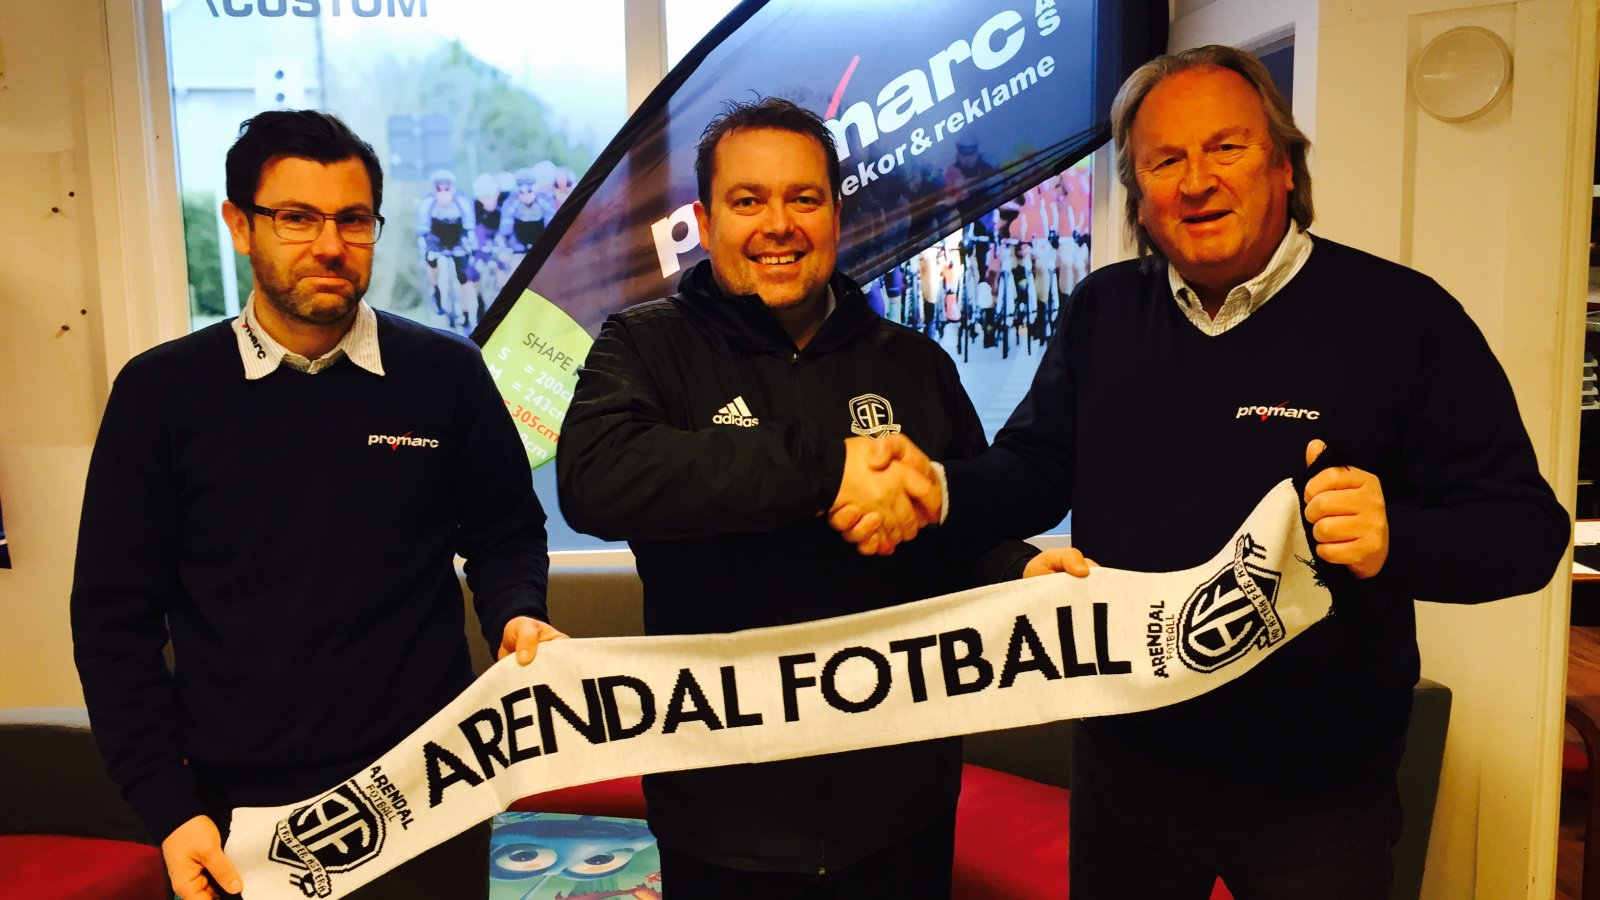 Daglig leder Mats Alfredsen (til venstre) og grunder Bjørn Hagestrand (til høyre) ser frem til en spennende sesong sammen med Arendal Fotball i Obosligaen.